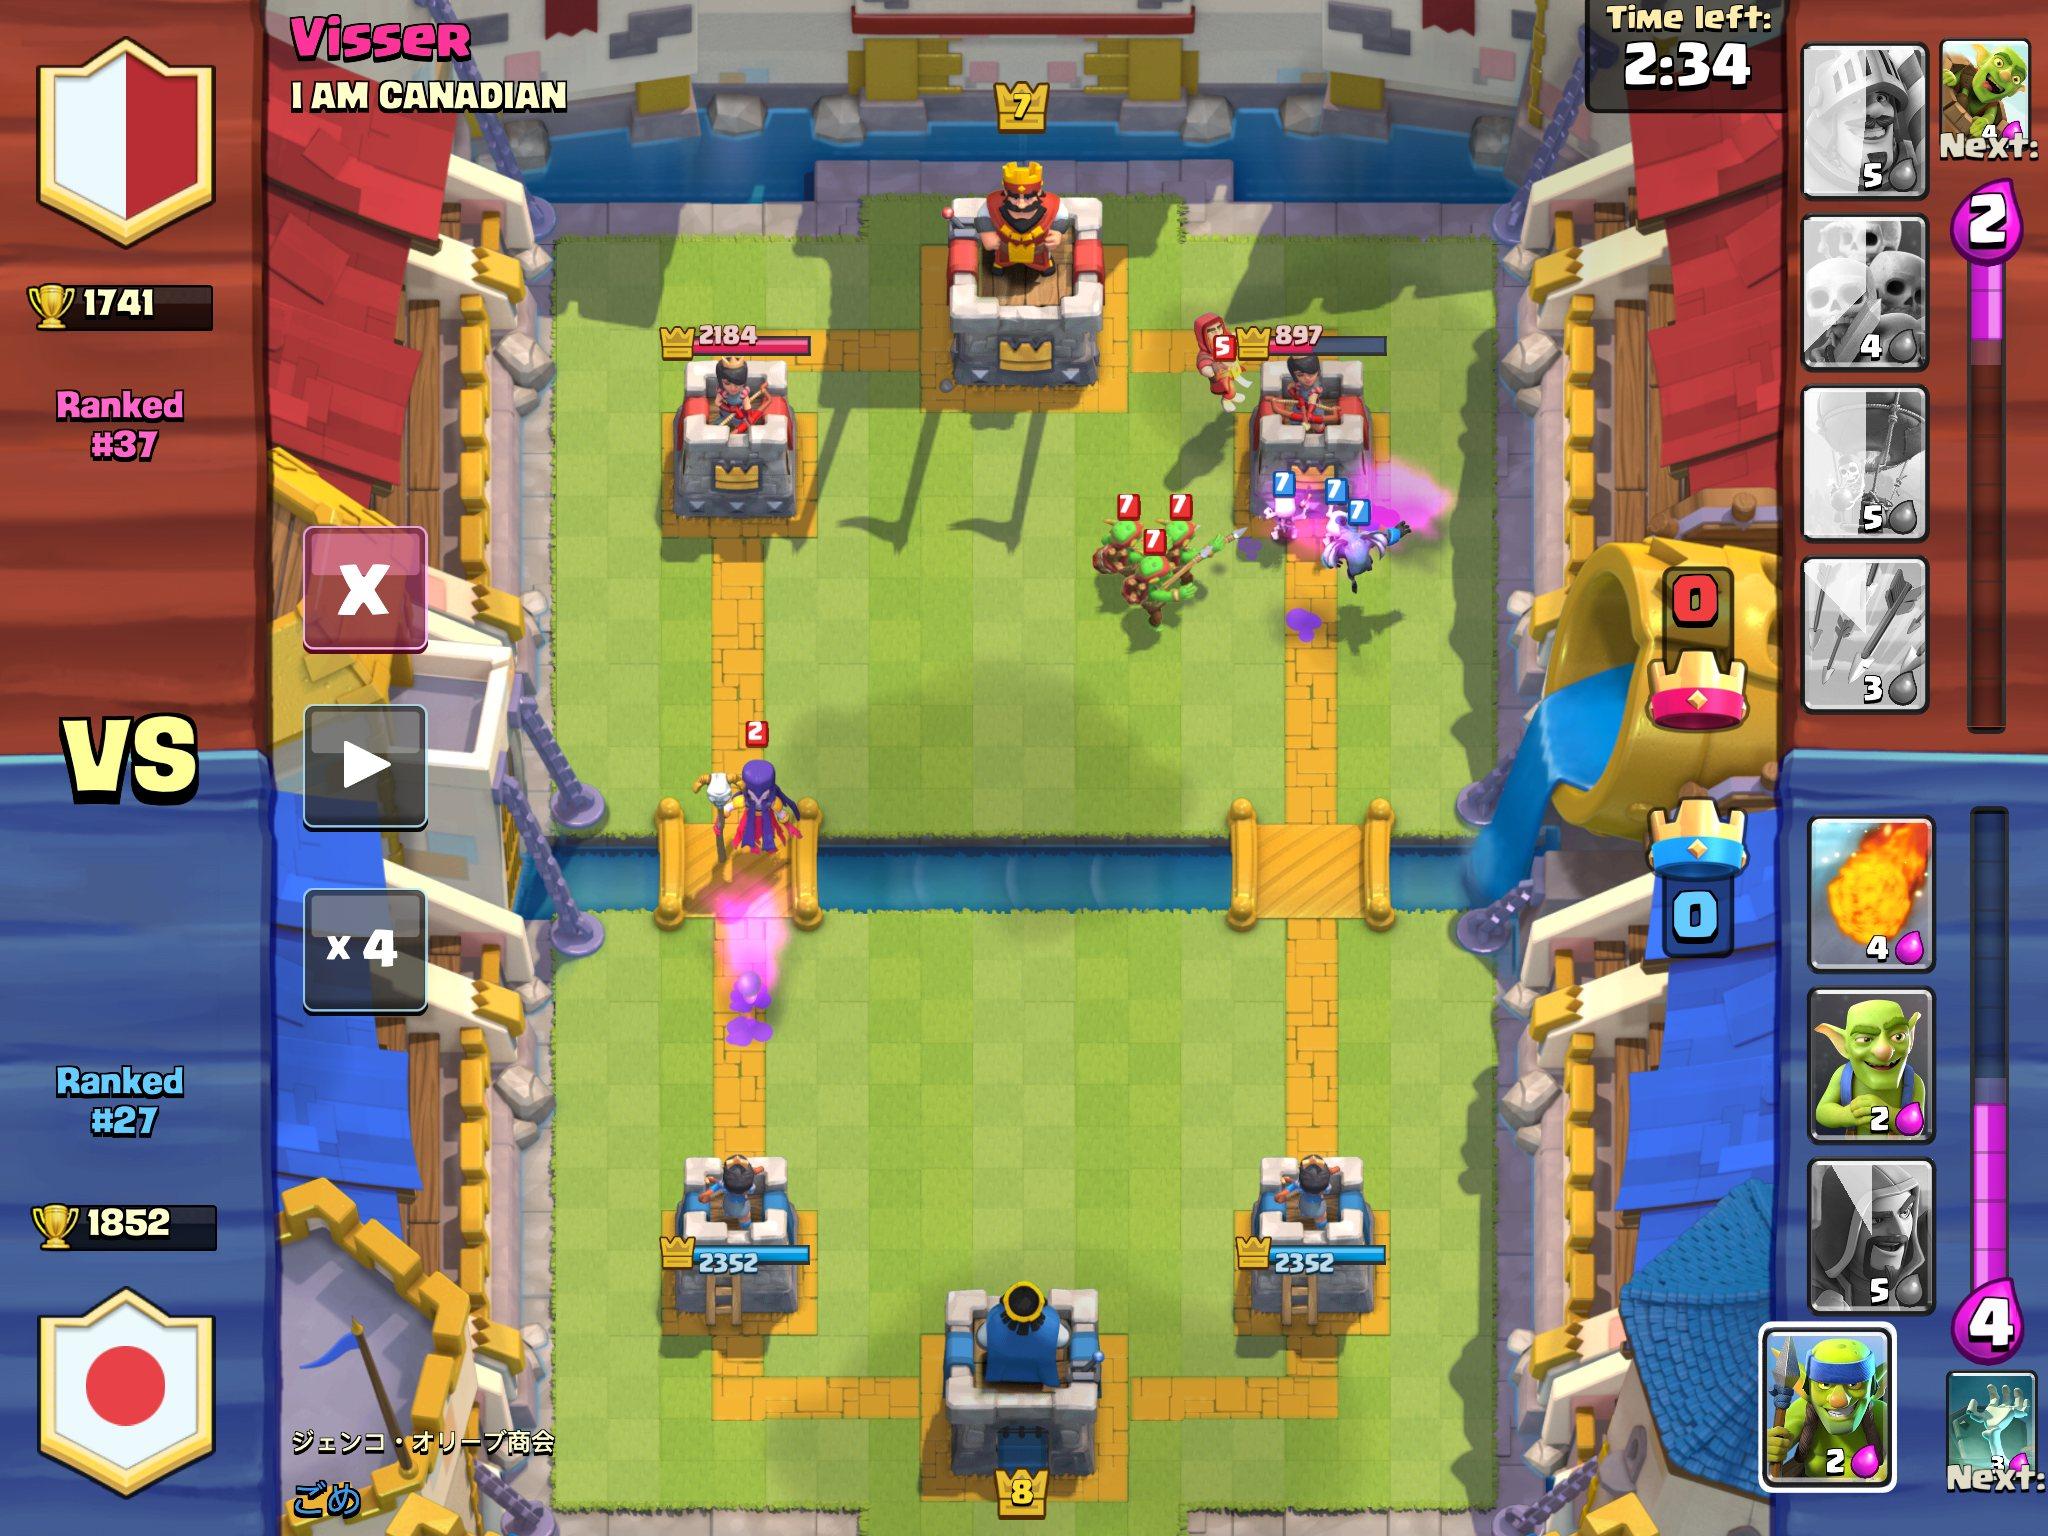 Clash-Royale-Versus-Match.jpg